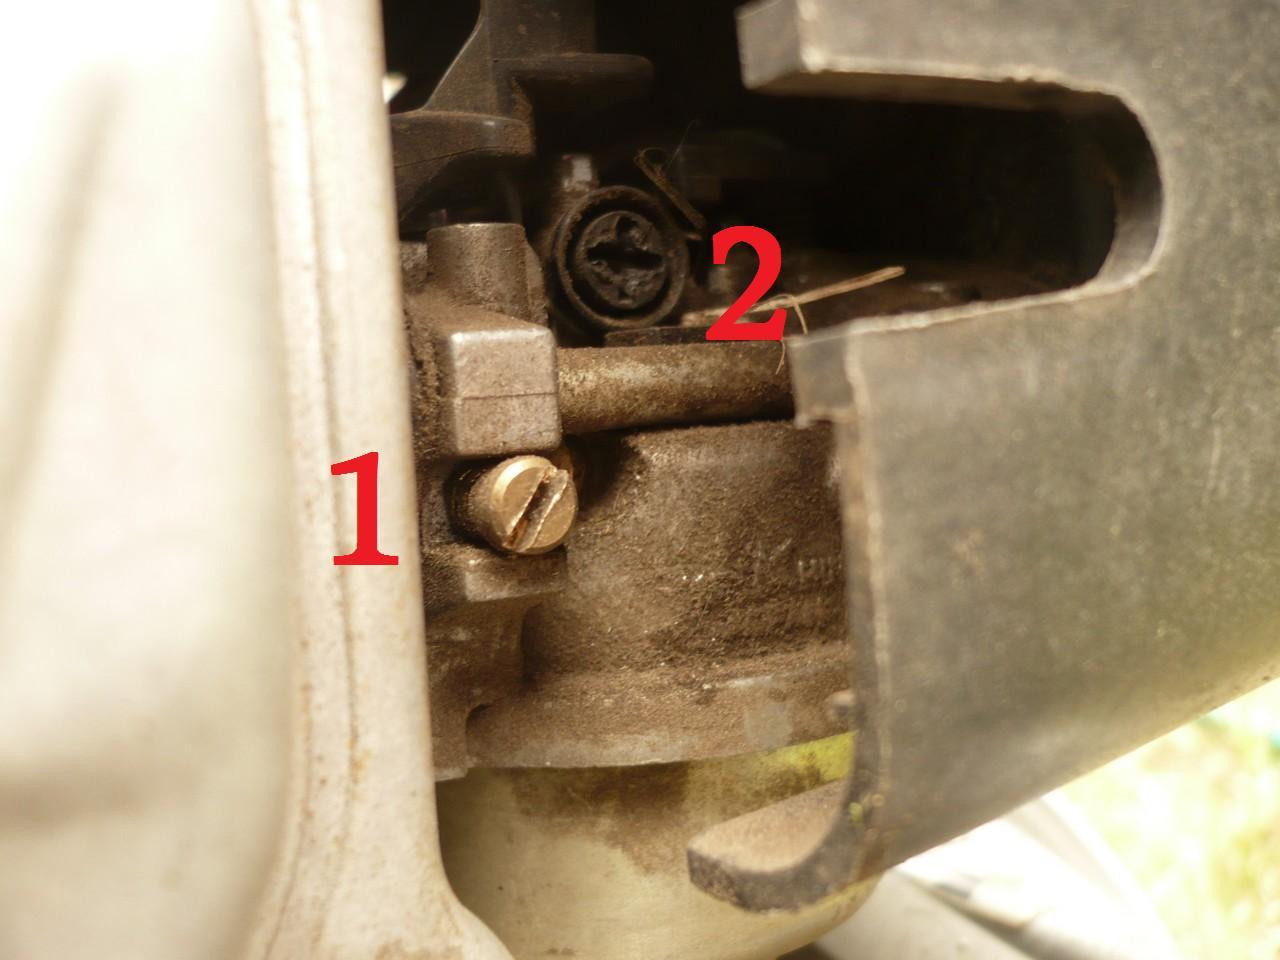 Honda GXV 140 - Regulacja ga�nika i obrot�w.